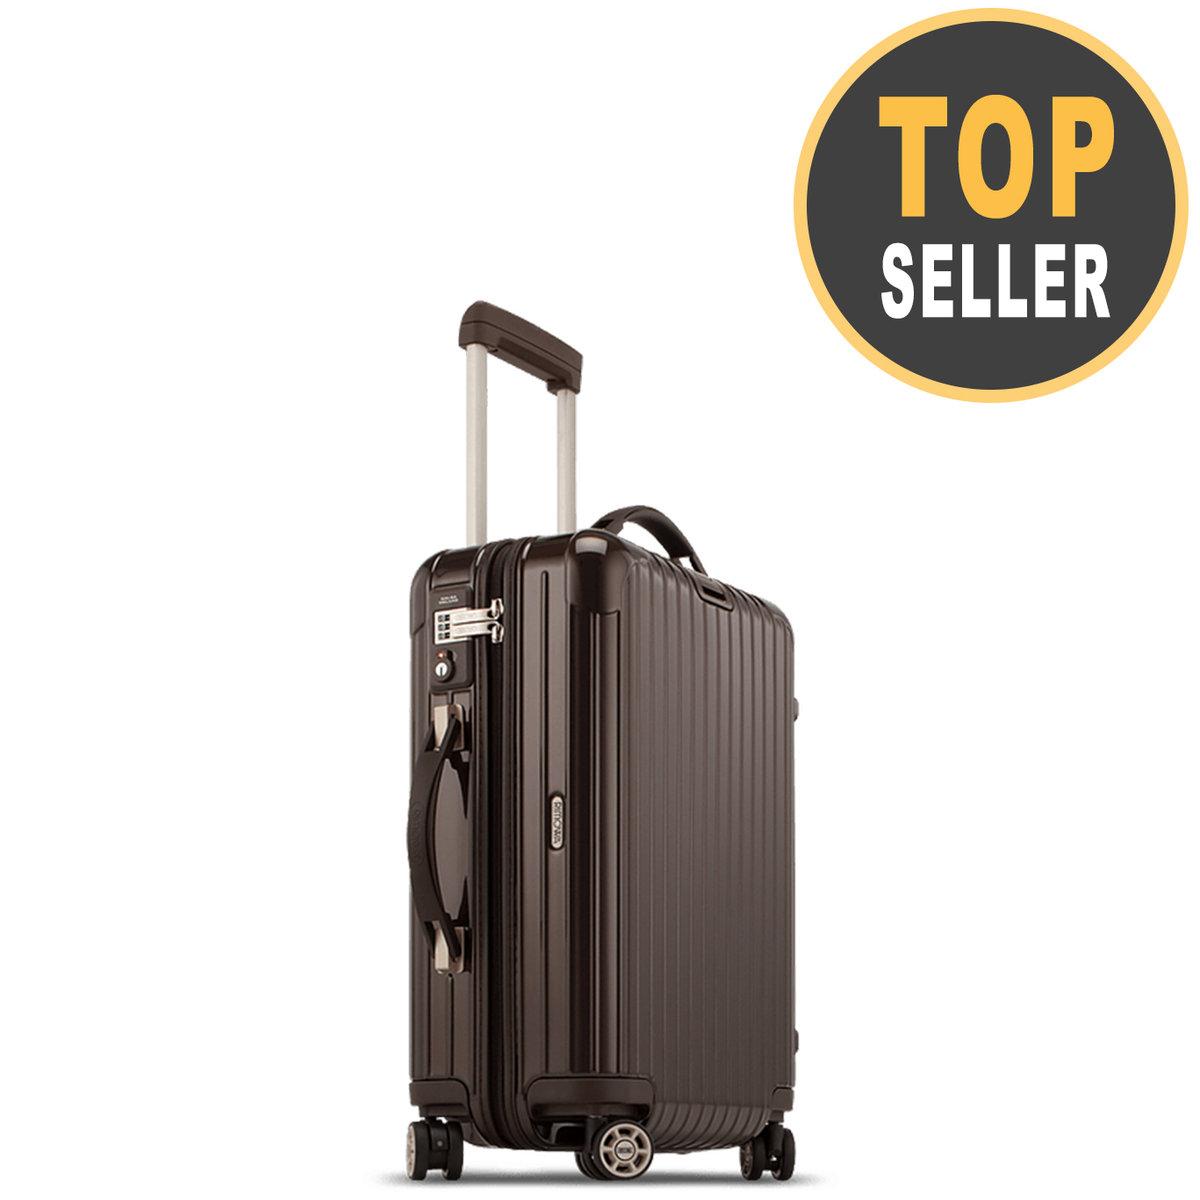 Rimowa Salsa Deluxe 32L CABIN MULTIWHEEL® Luggage 83152004   Brown